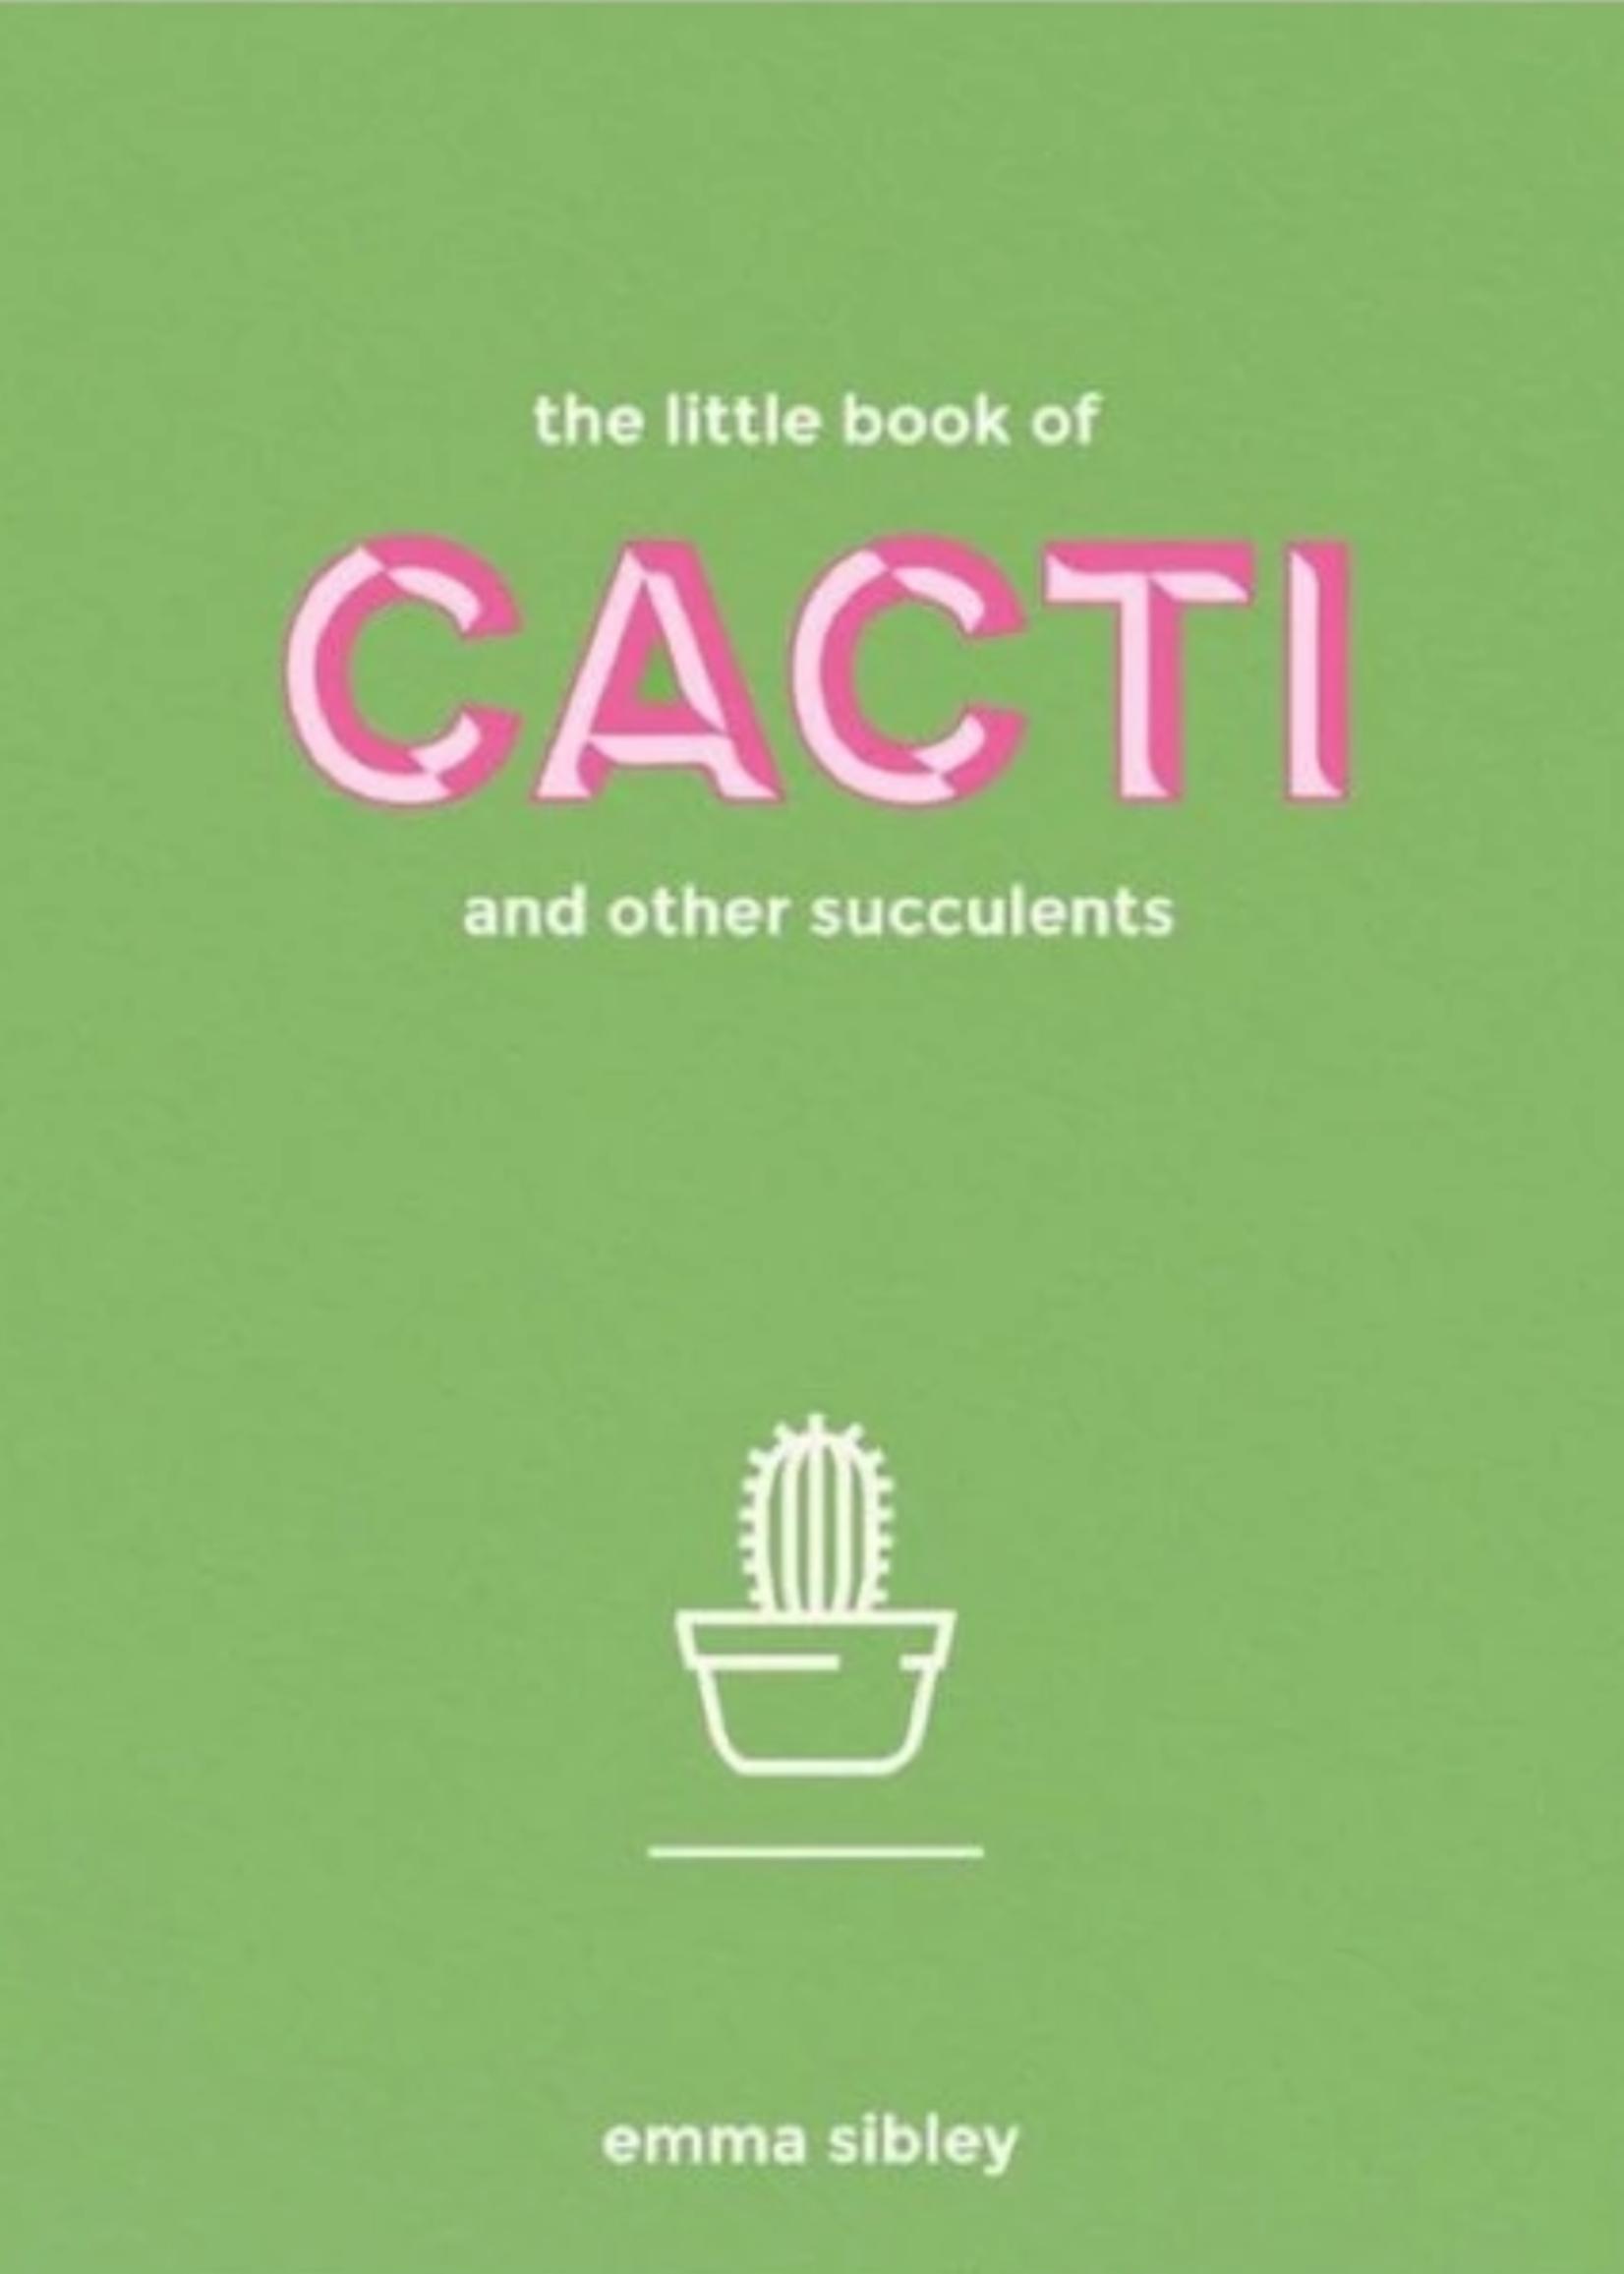 hachette book group hachette little book of cacti